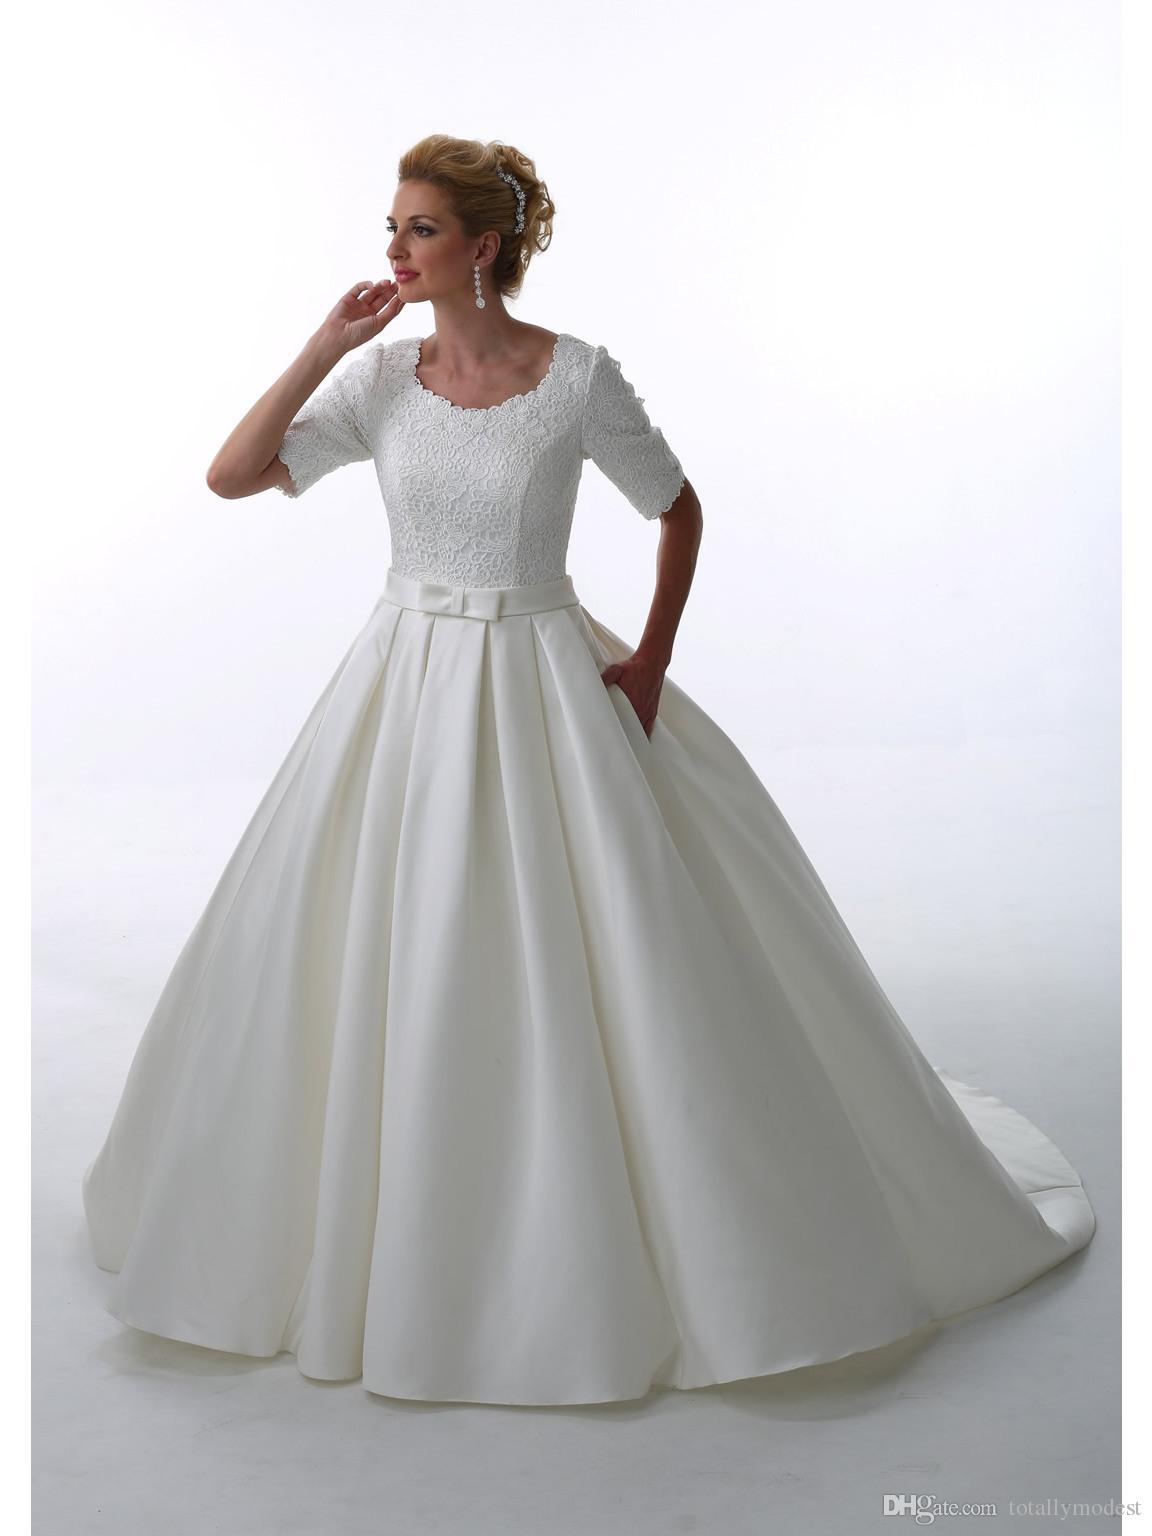 2016 Ball Gown Lace Satin Modest Wedding Dresses Half